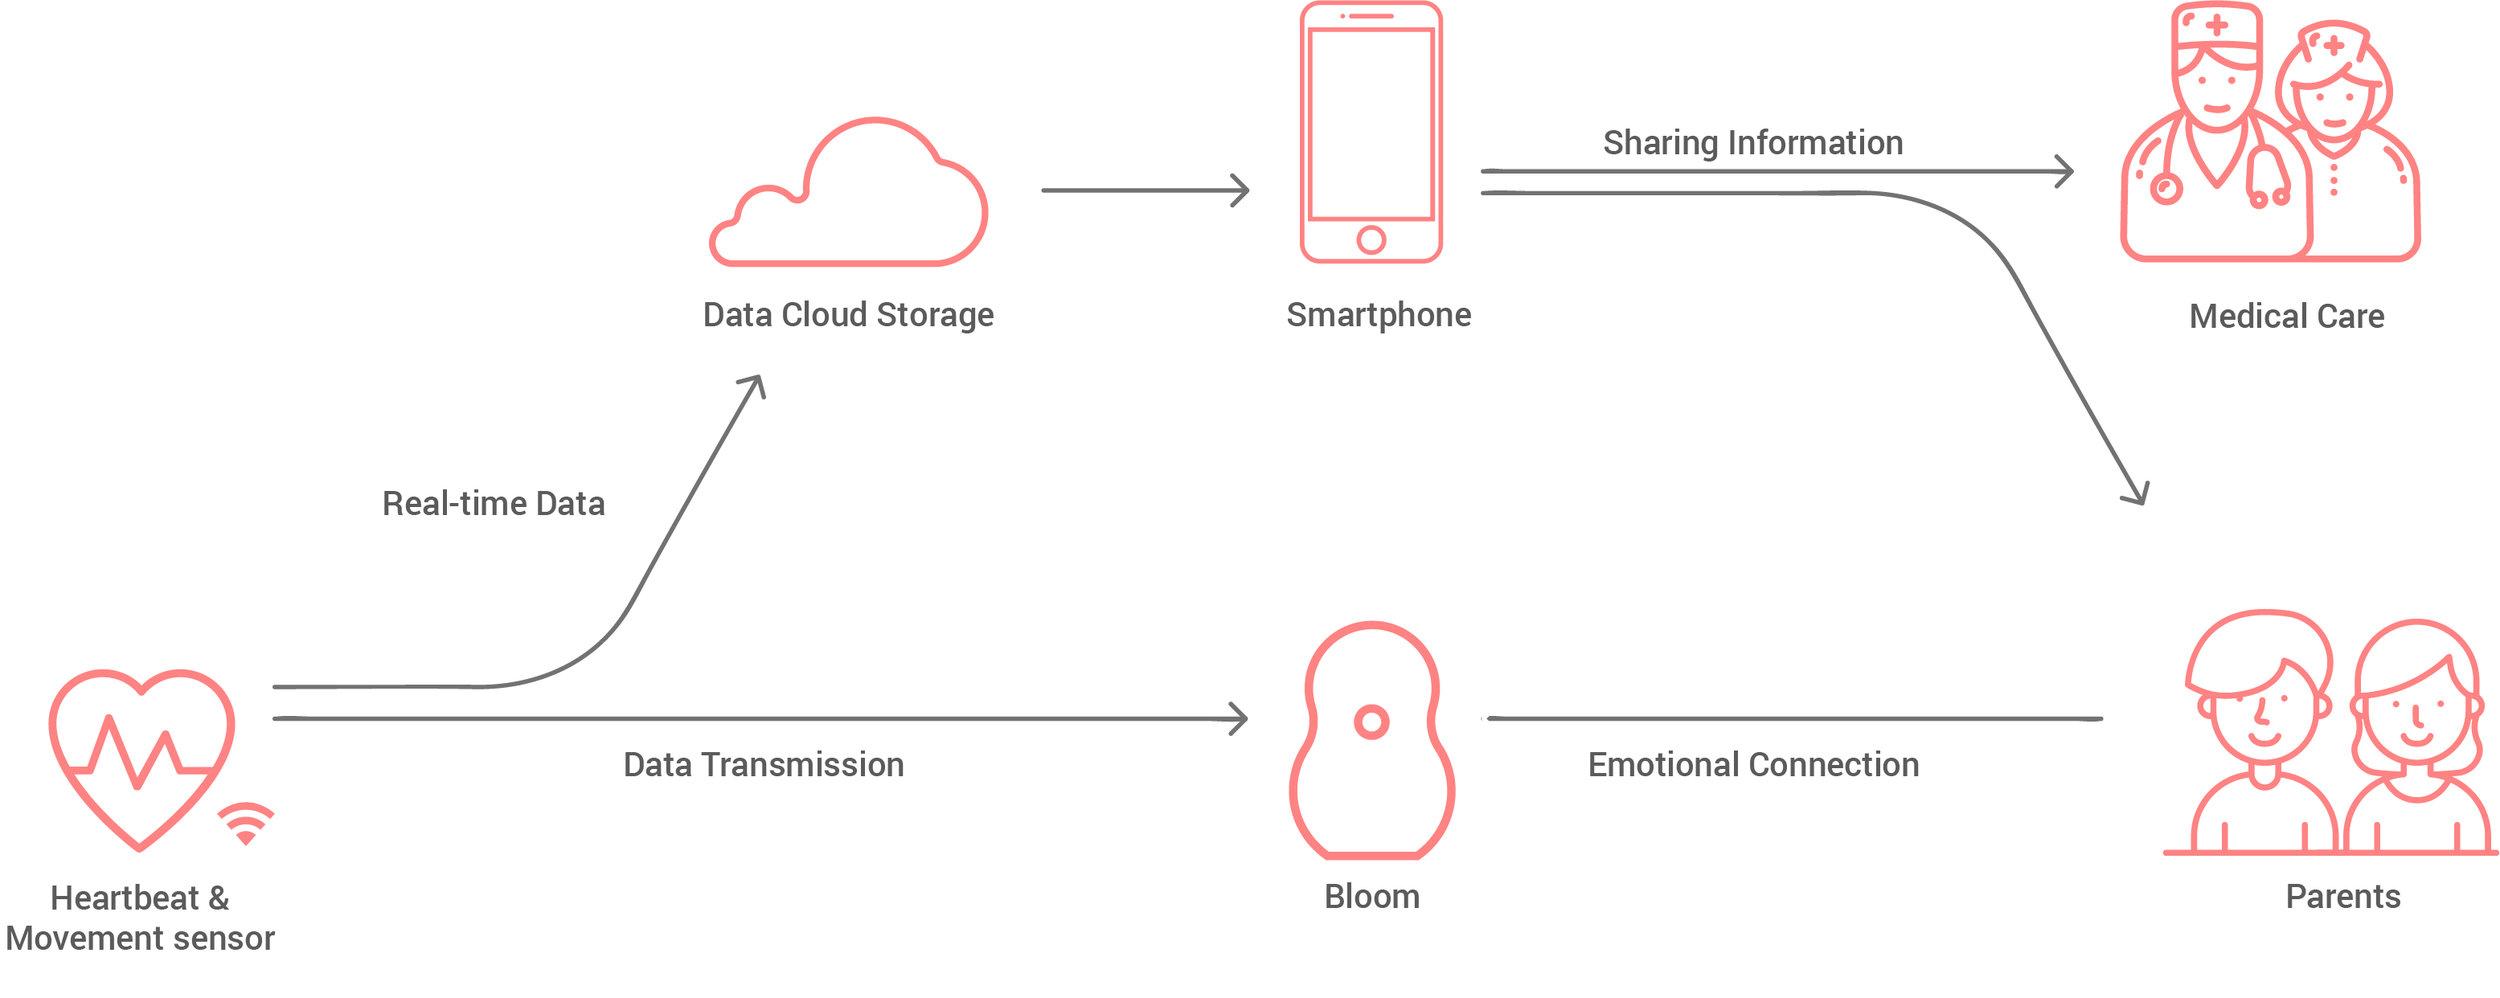 Bloom eco system.jpg